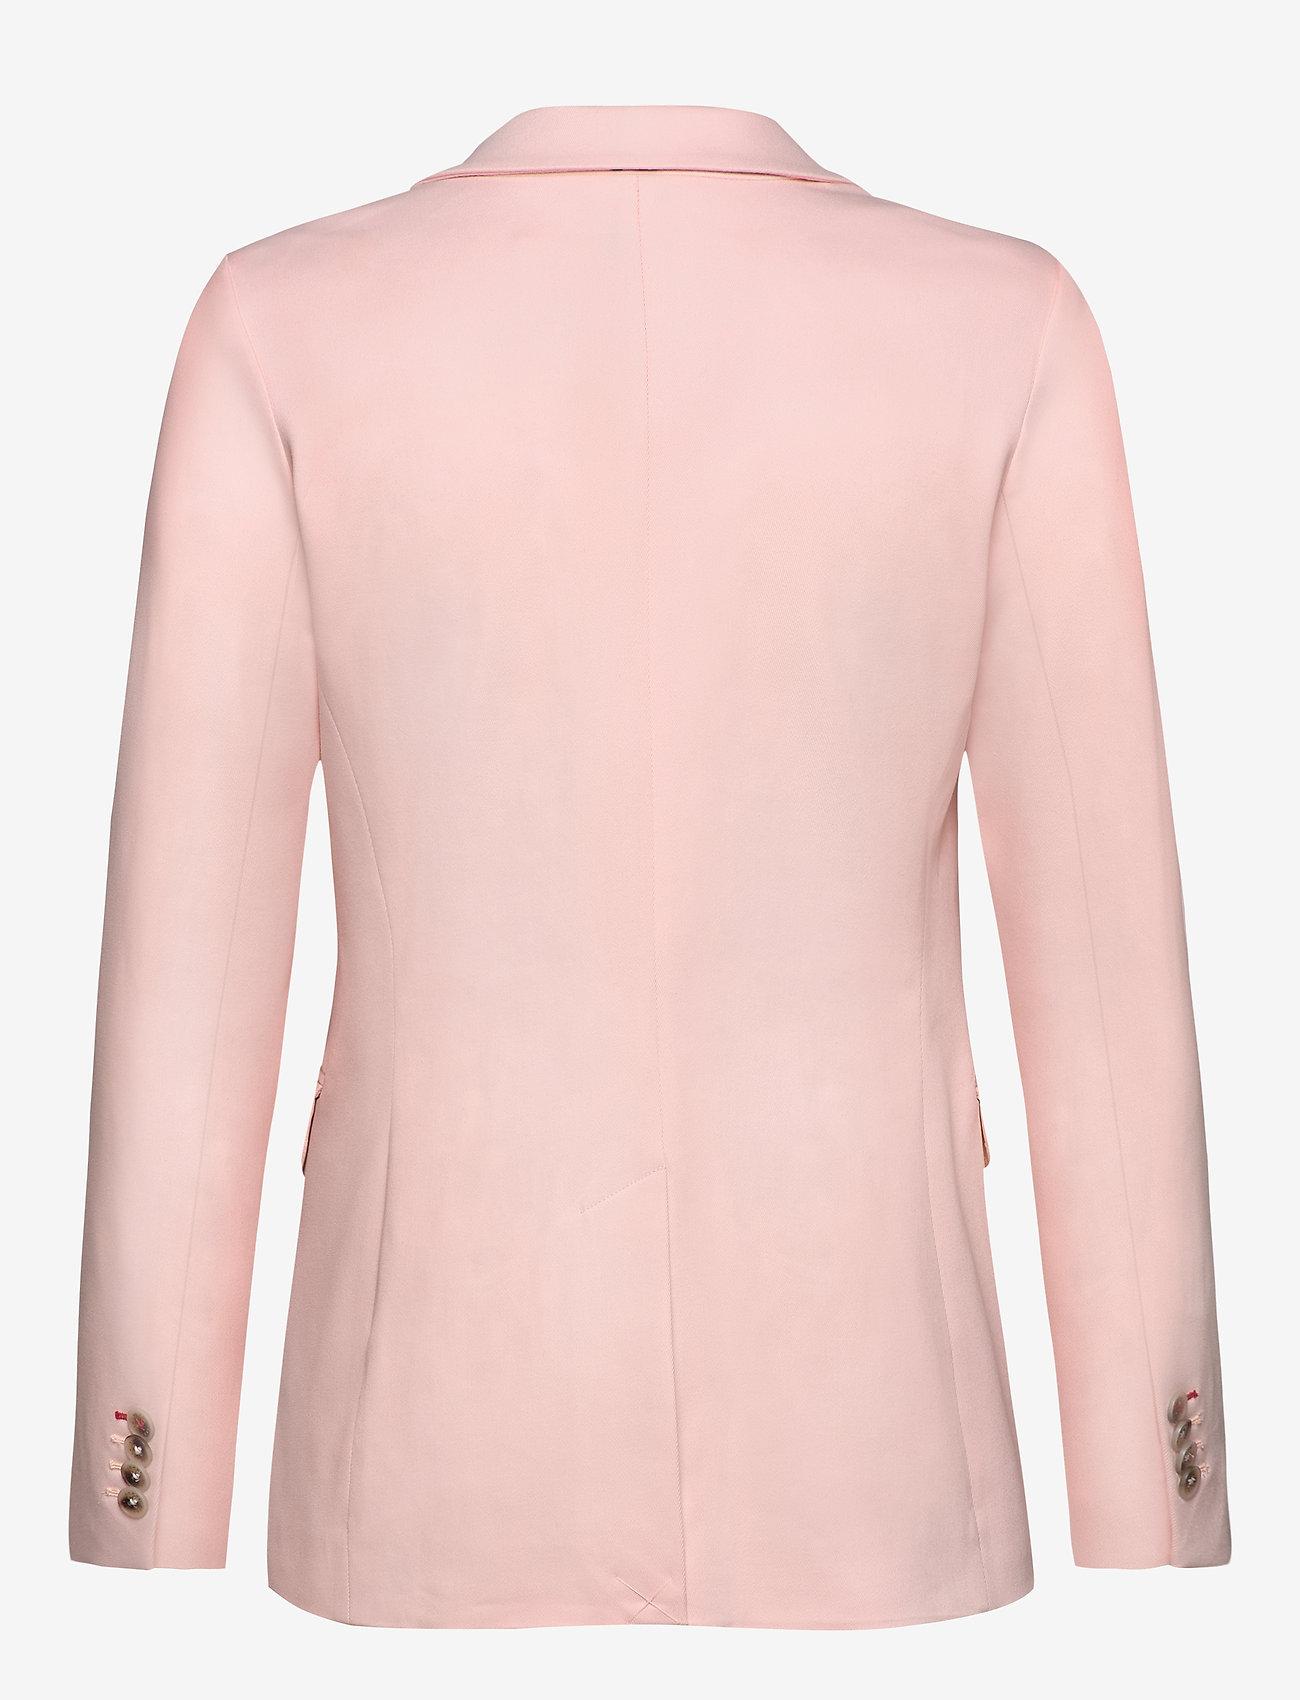 Tommy Hilfiger - COTTON PASTEL SB BLA - blazers - pale pink - 1